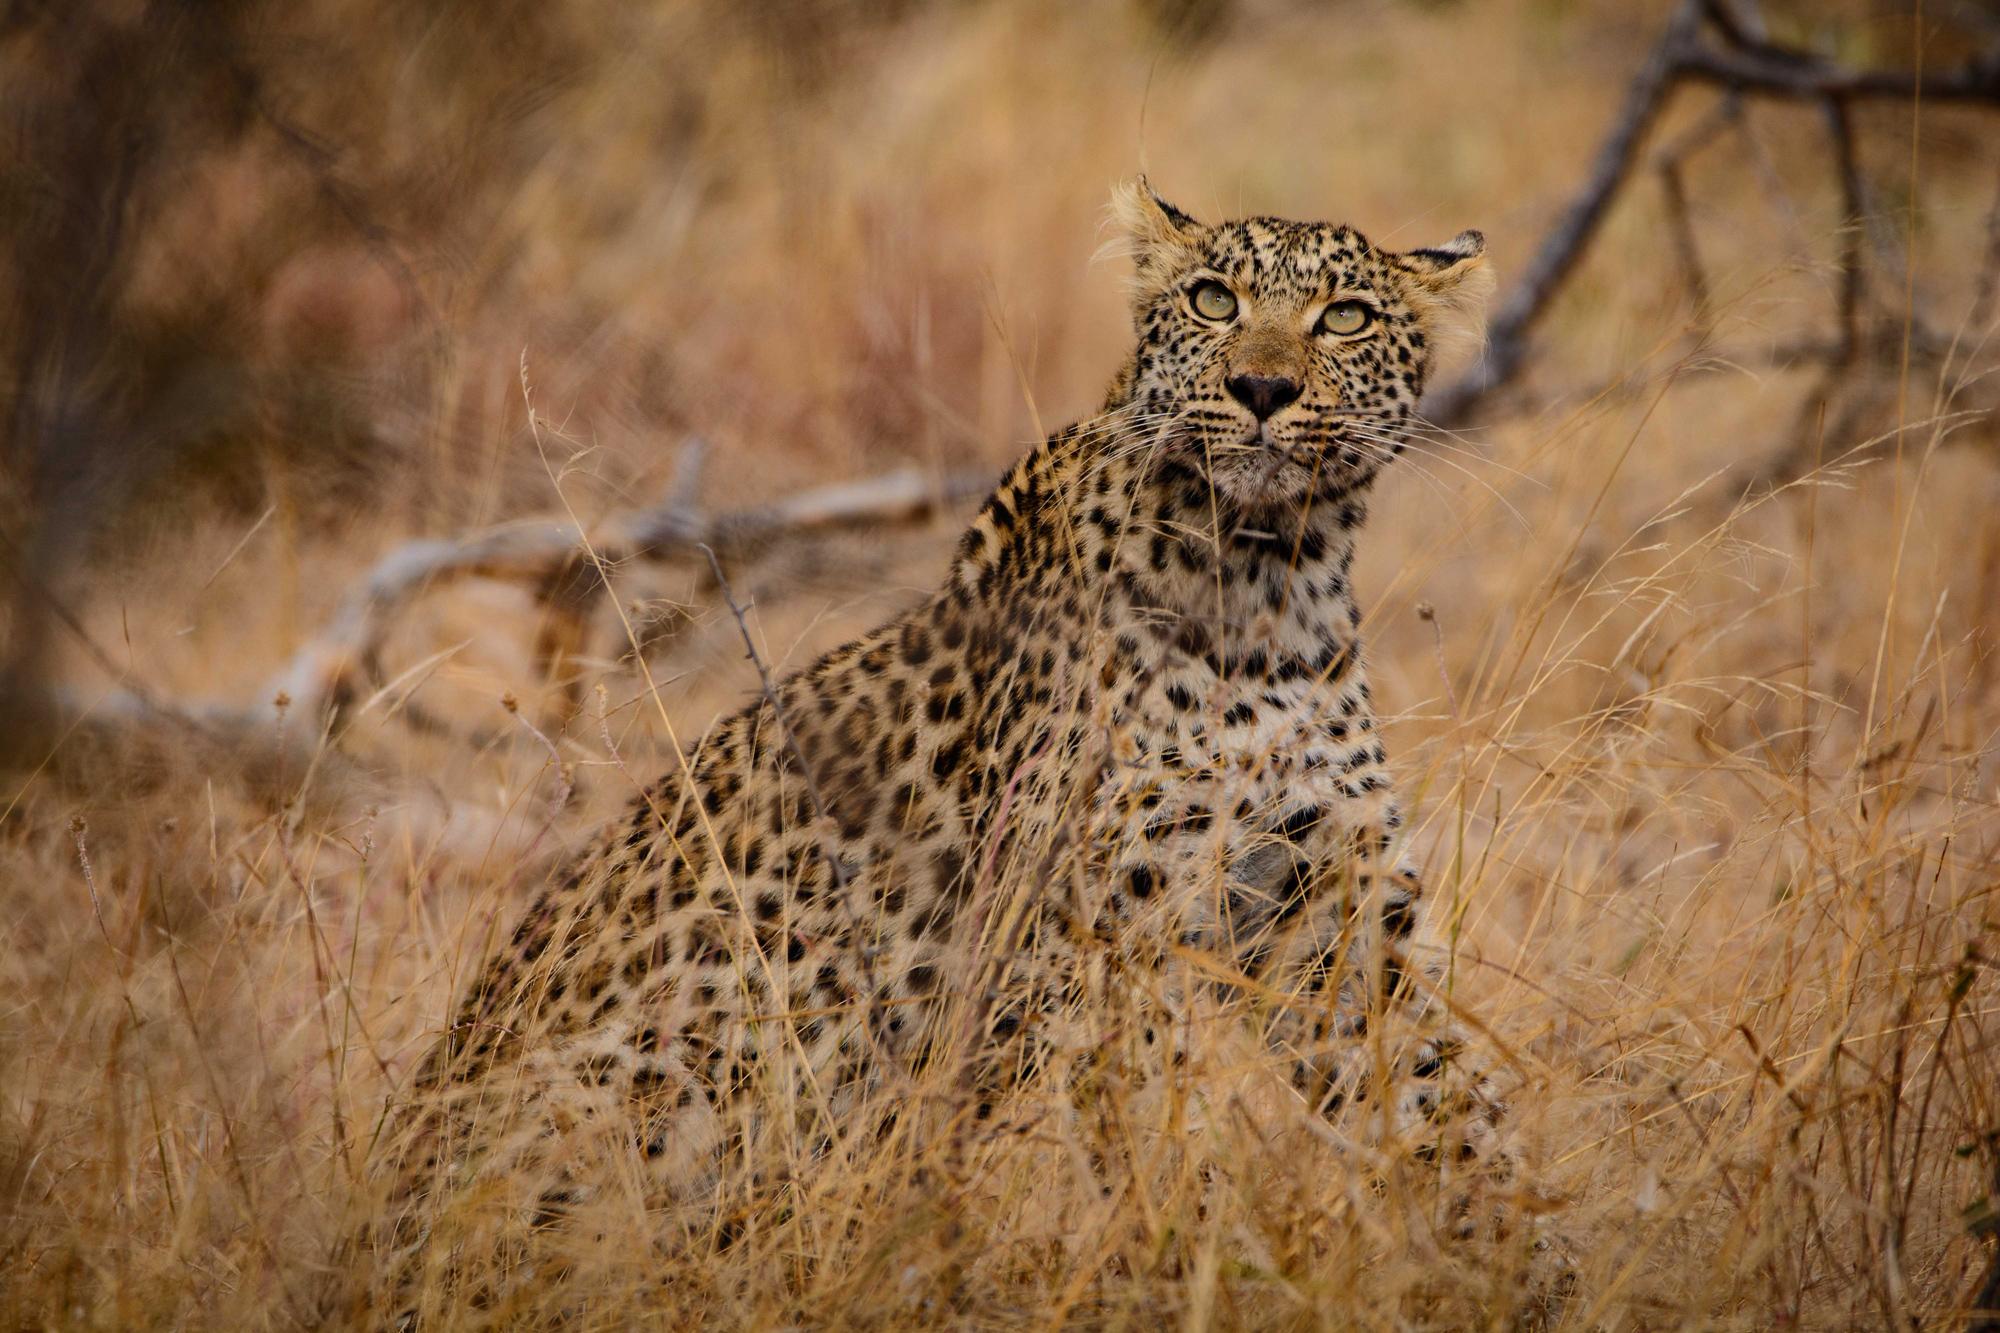 Young leopard in Kruger National Park